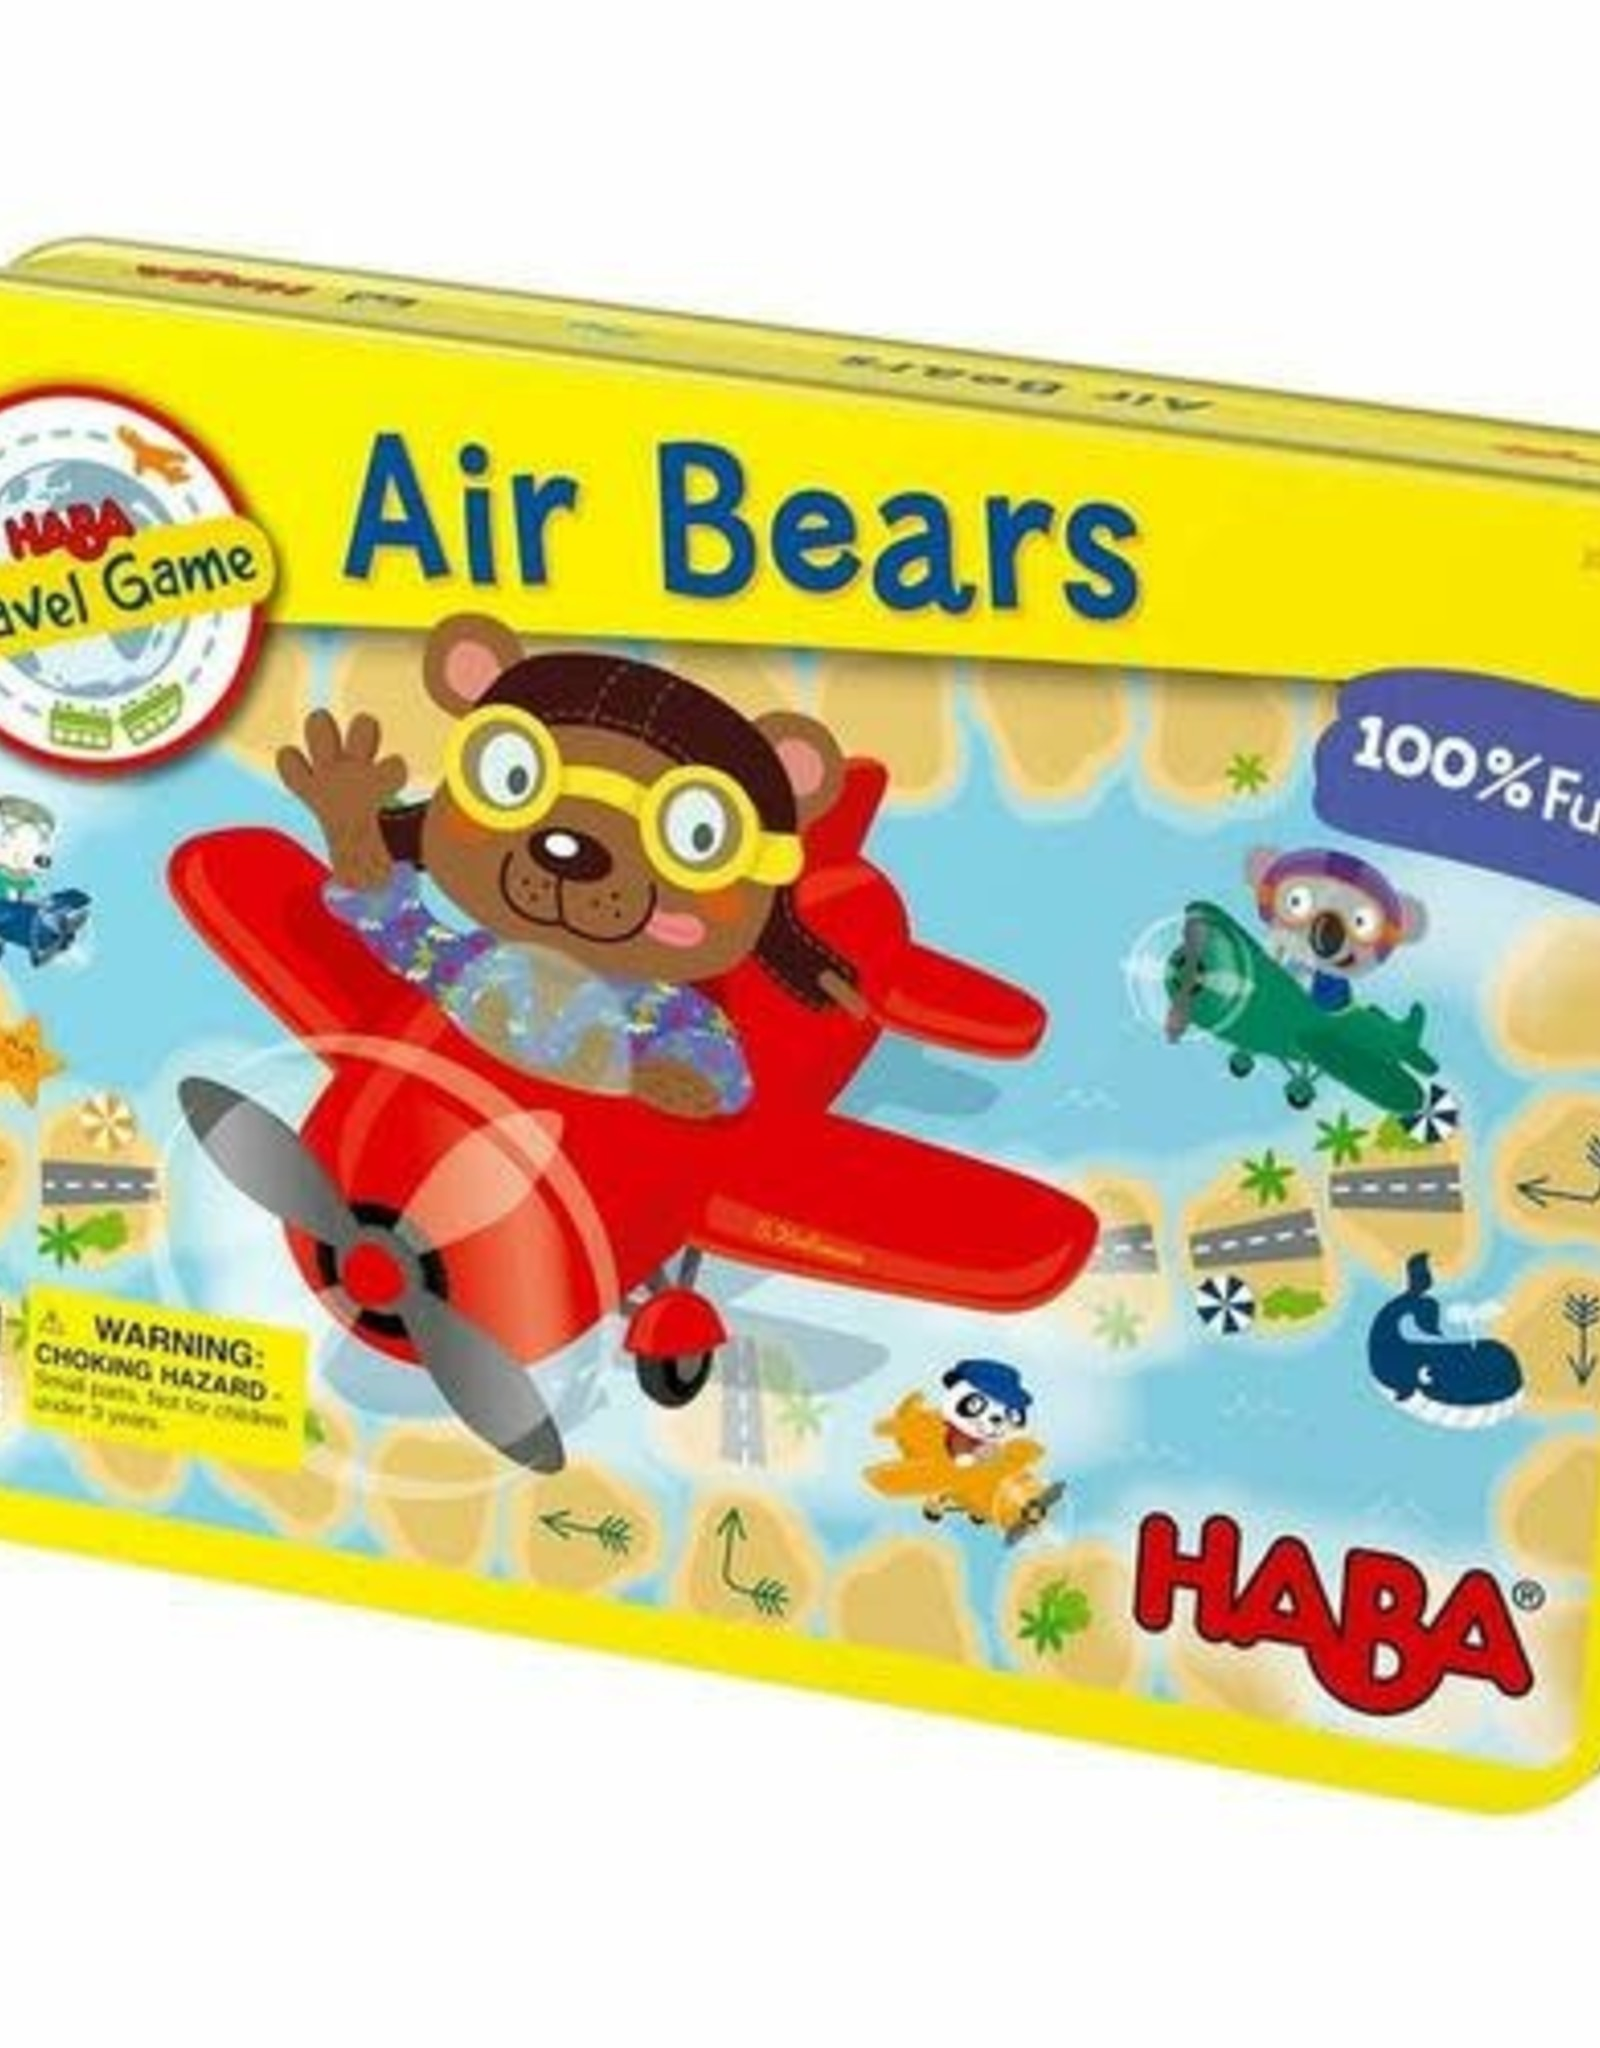 Haba Air Bears Game 4+